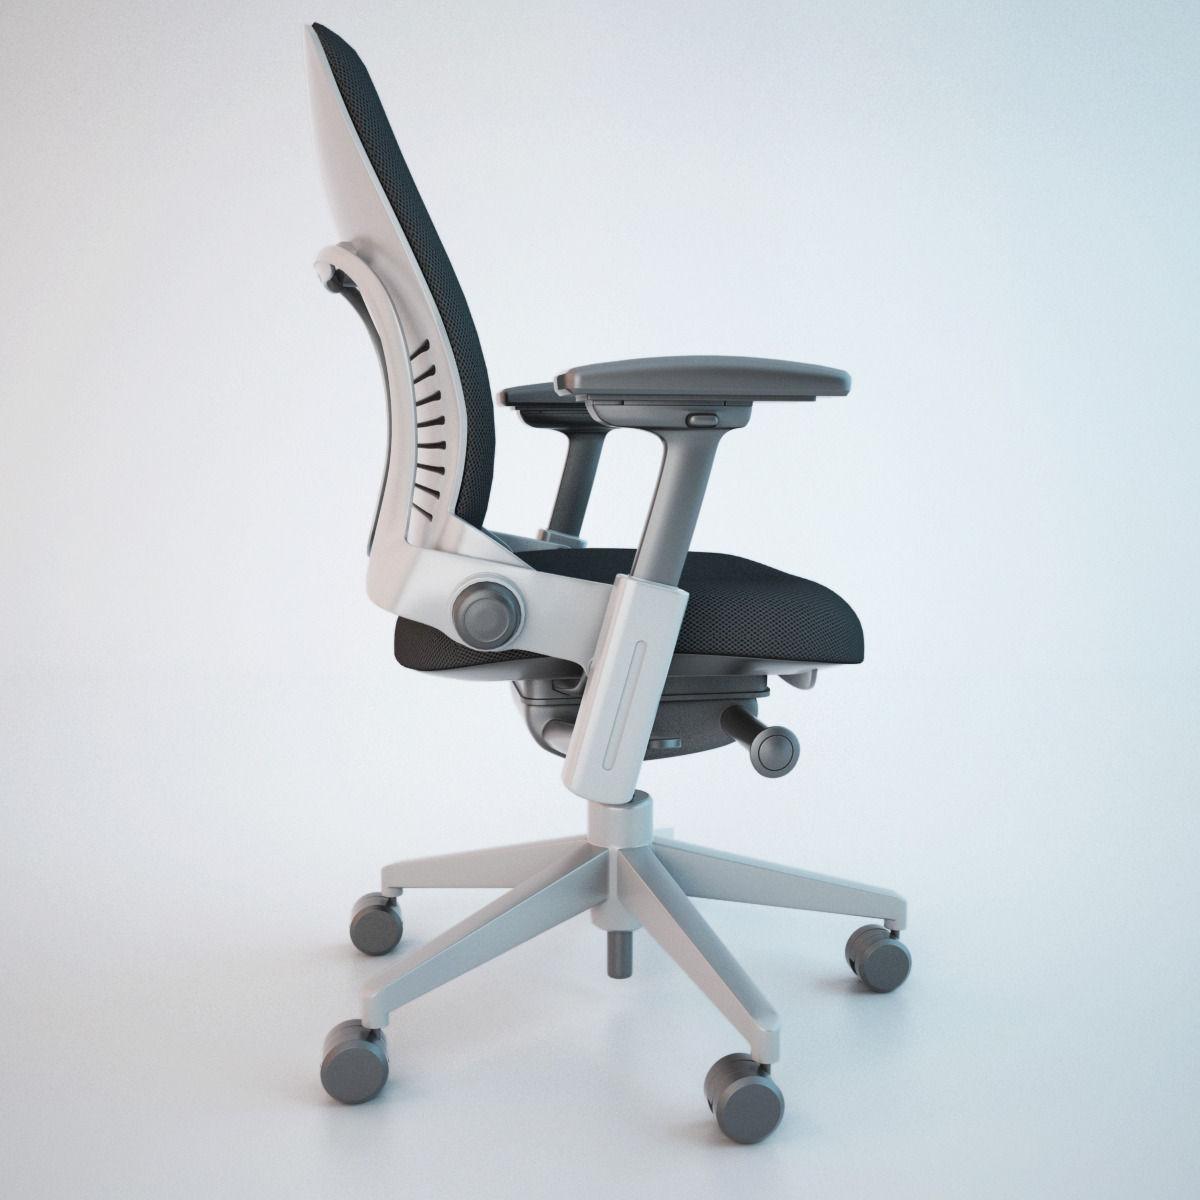 ... Steelcase Leap Office Chair 3d Model Max Obj Fbx 8 ...